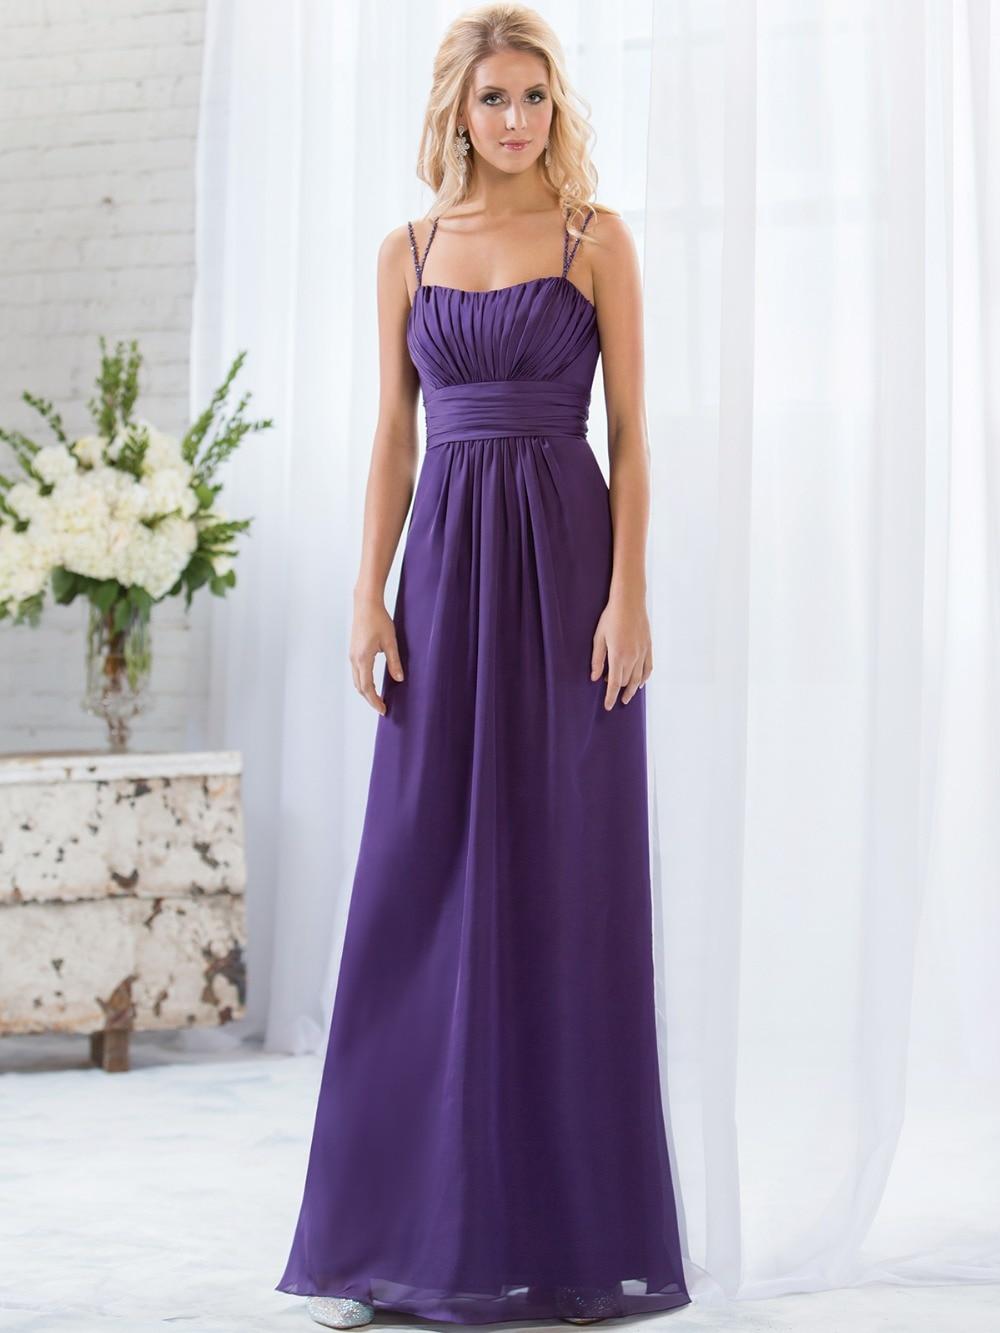 Belk Bridesmaid Dresses Image collections - Braidsmaid Dress ...